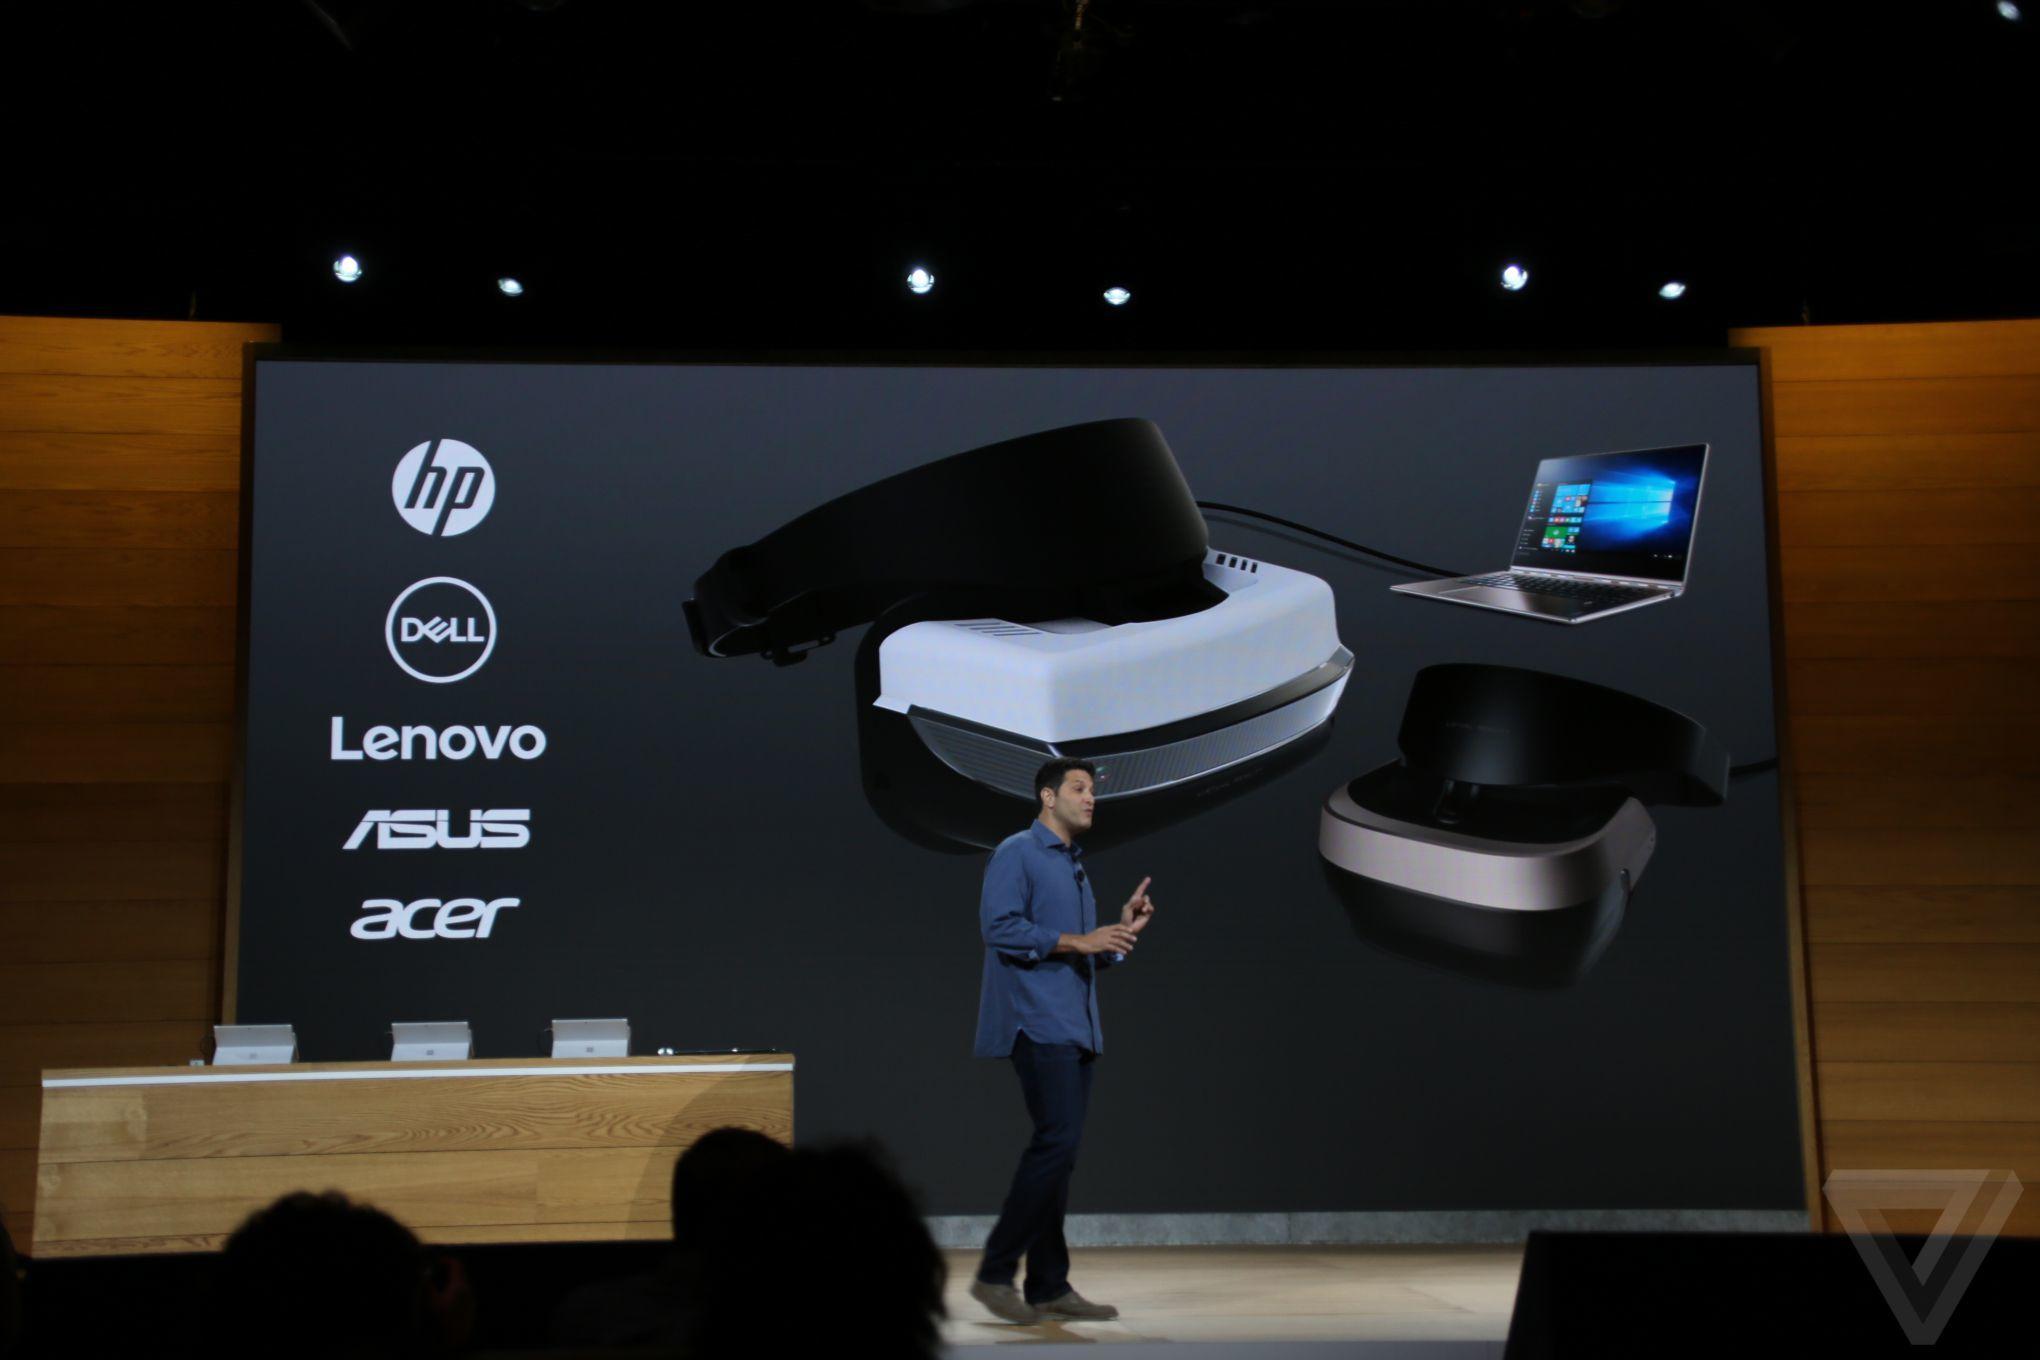 windows-10-vr-headset-gamesoul-2